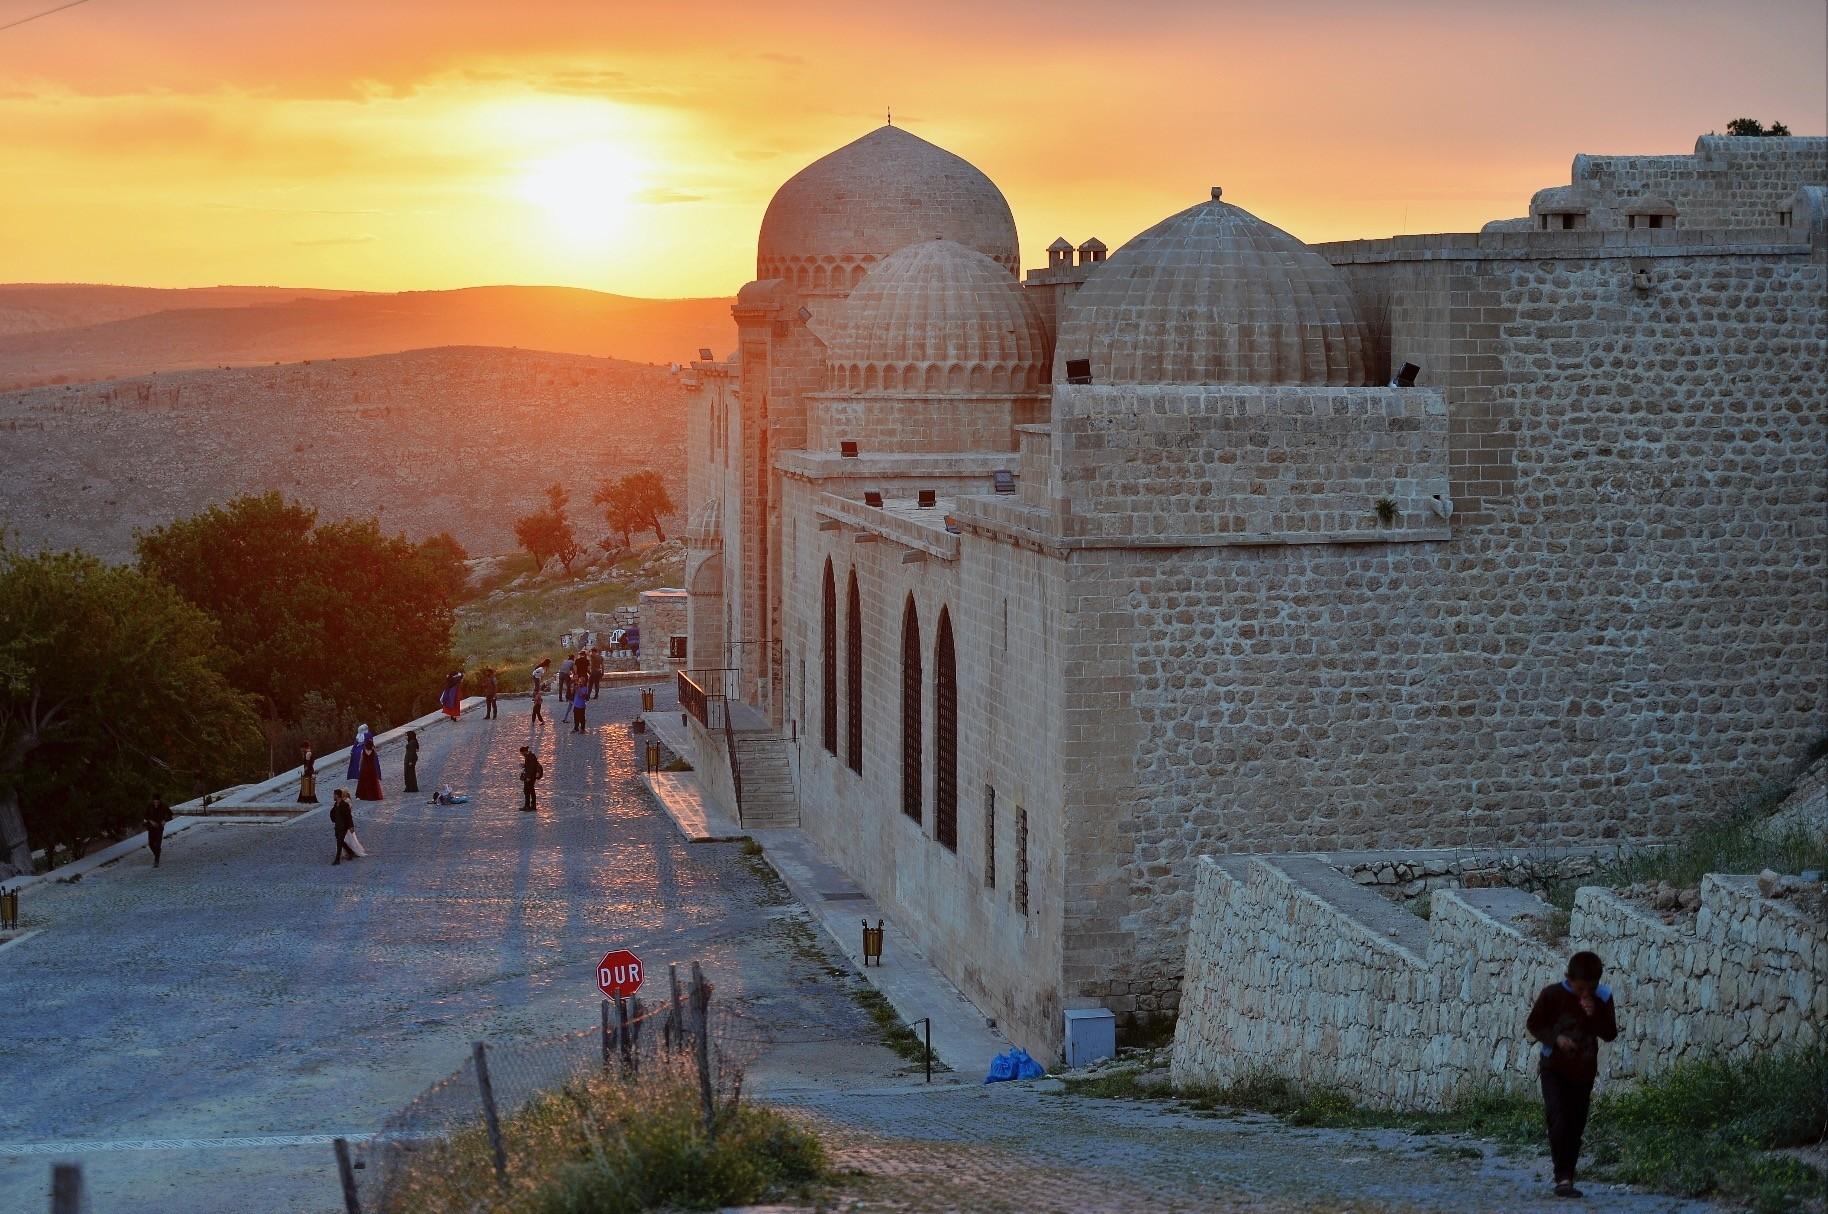 Kasu0131miye Madrasah in Mardin province.